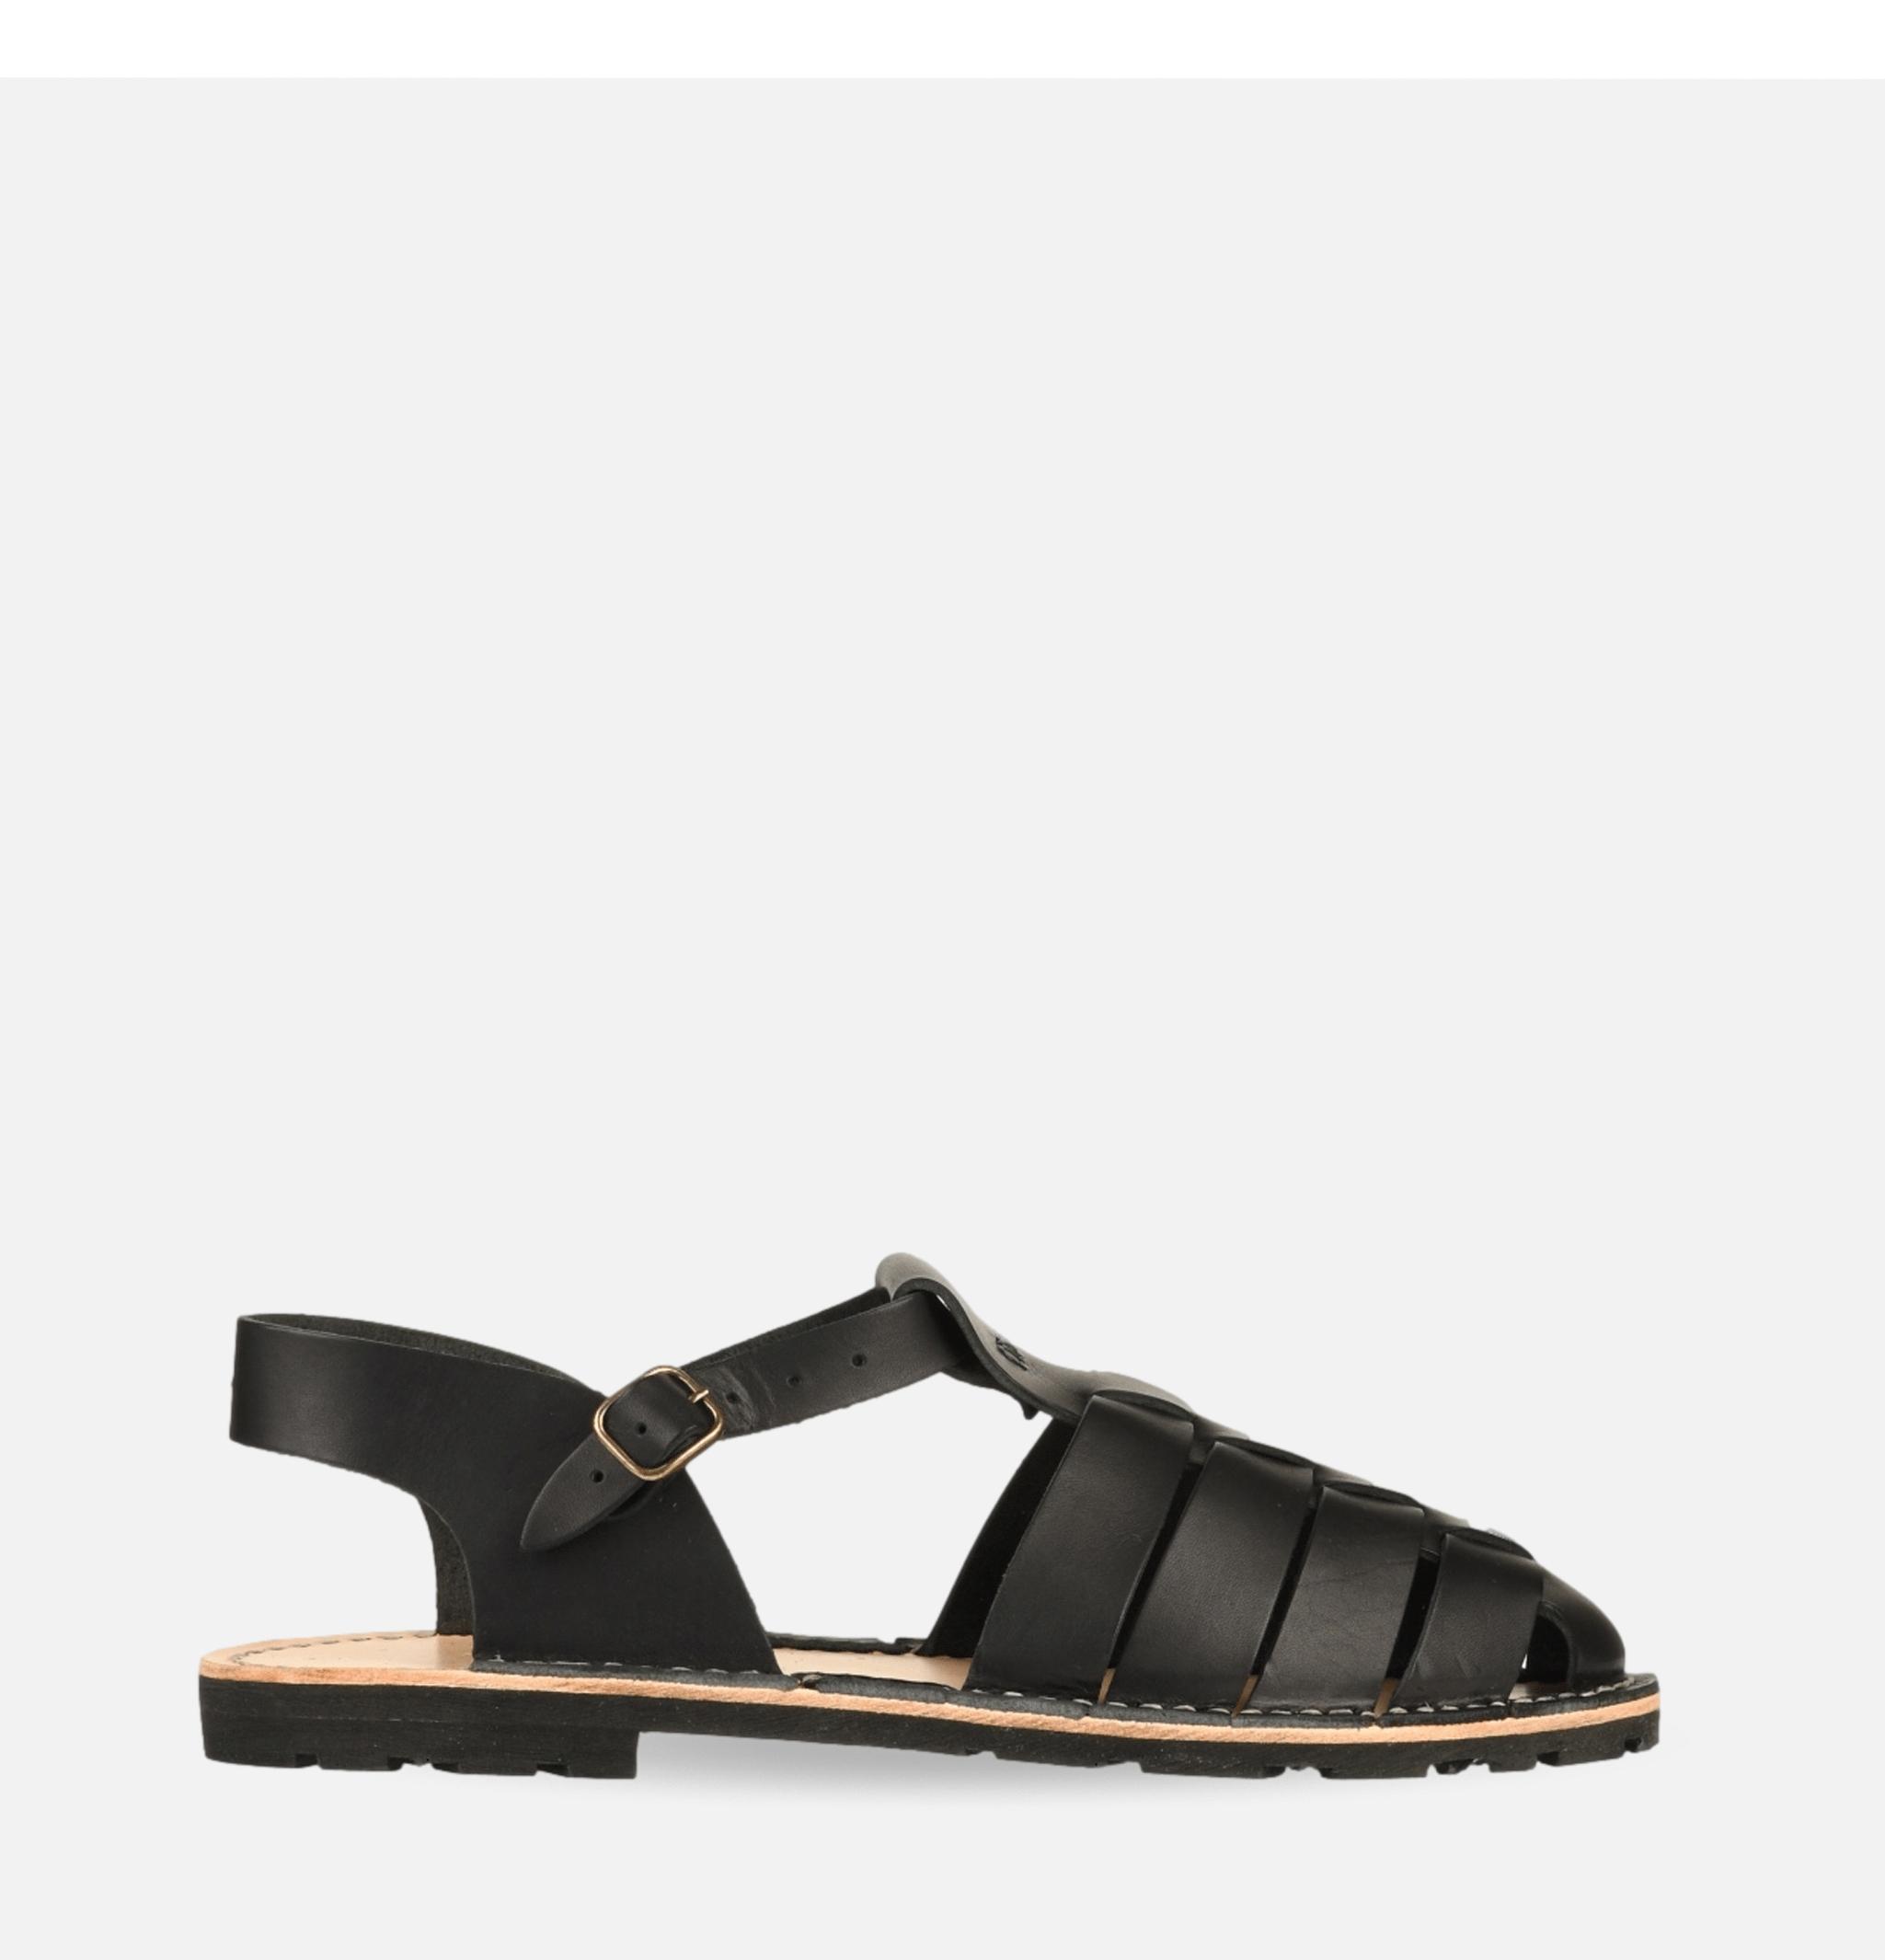 Artisanal Sandal Shoe 09 Black